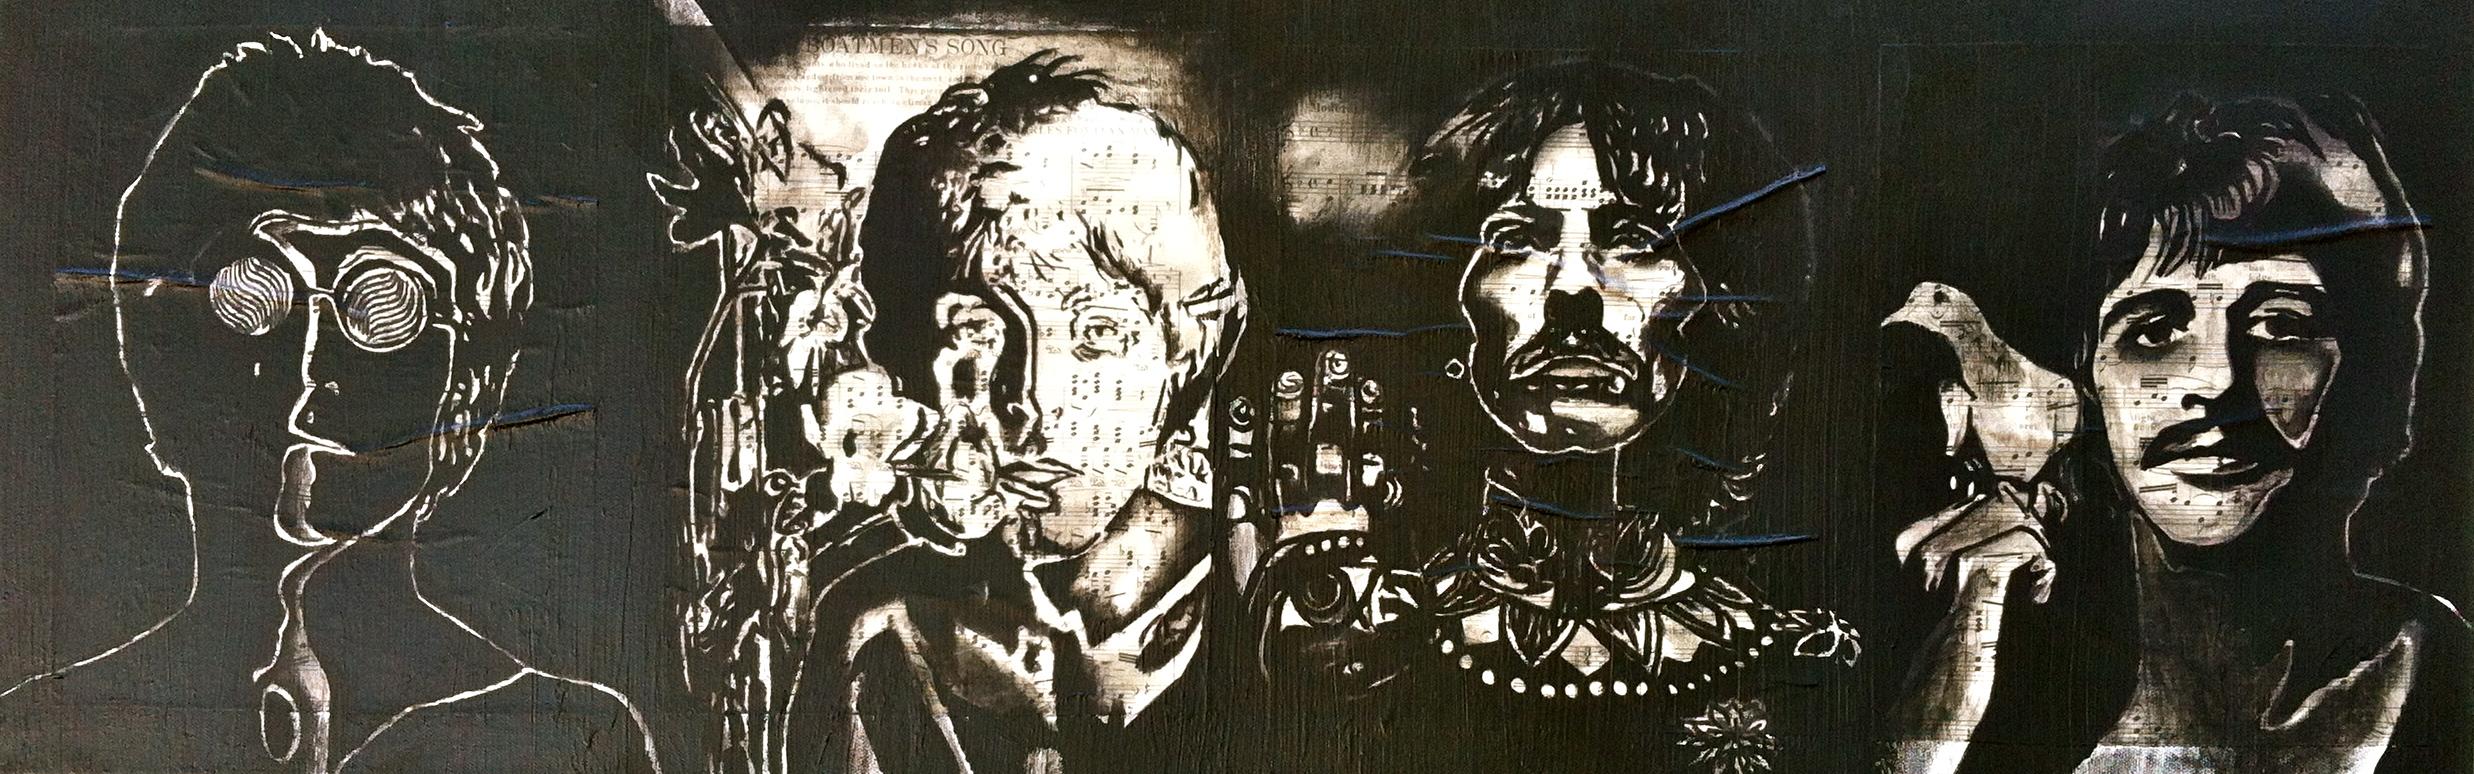 "The Beatles, 2012   Mixed media on canvas 12""x36"""